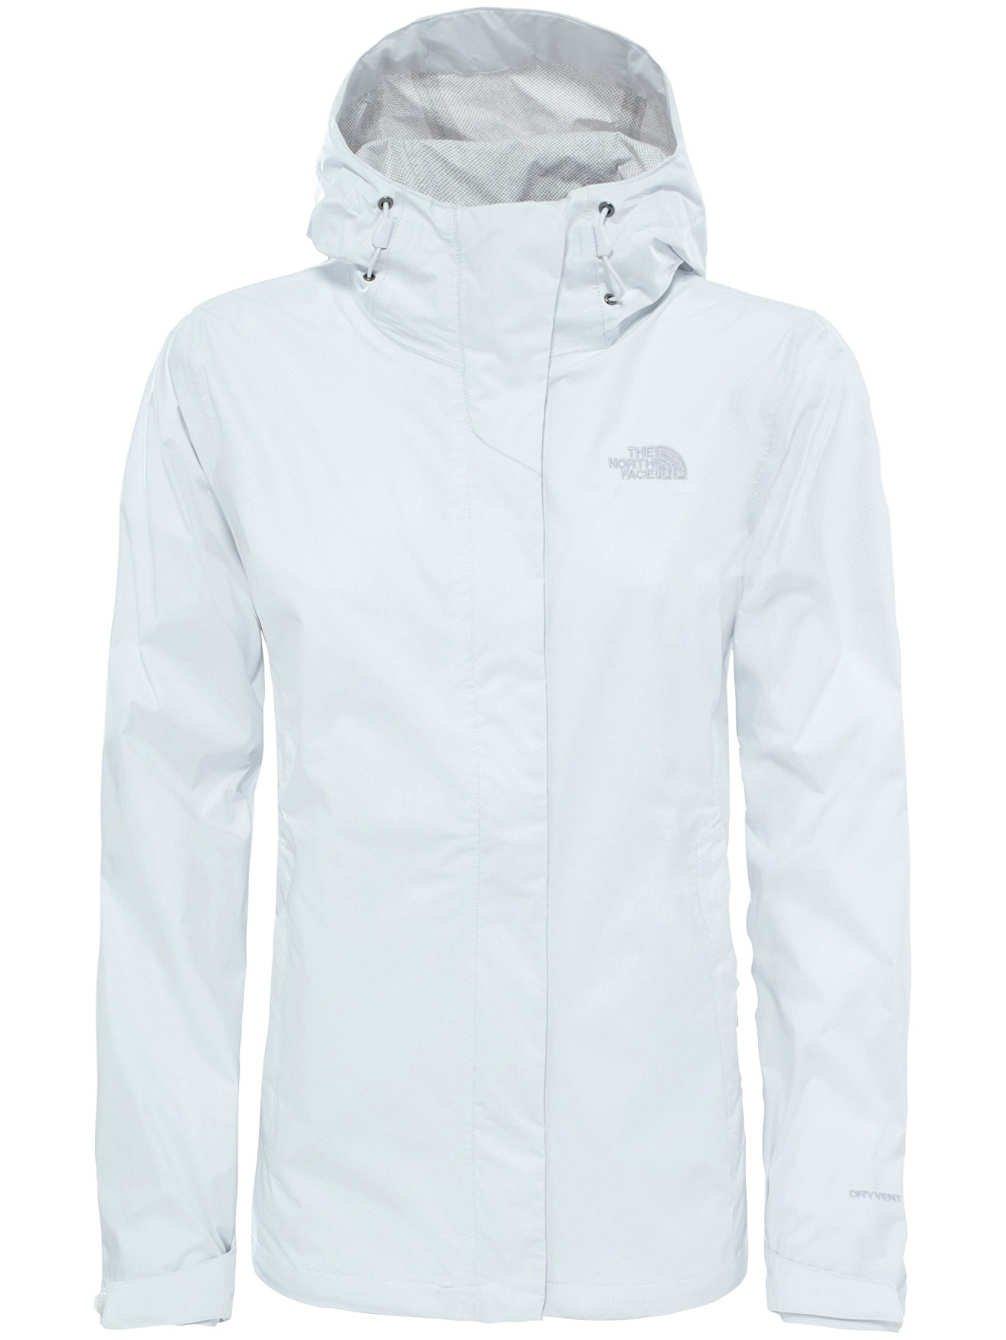 The North Face Womens Venture 2 Jacket(Medium,TNF White)